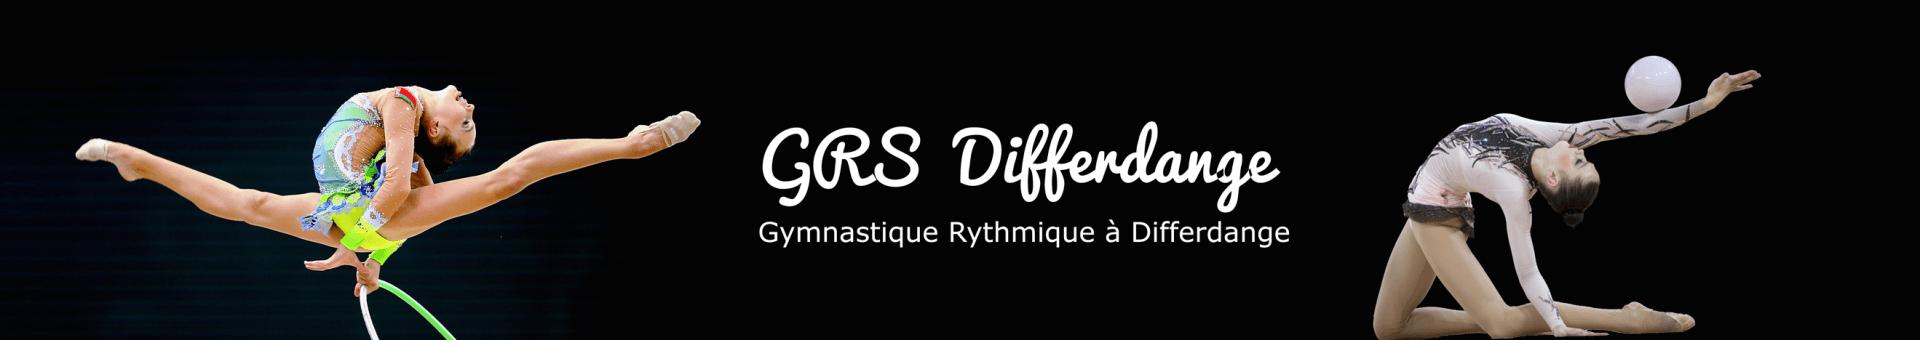 GRS Differdange